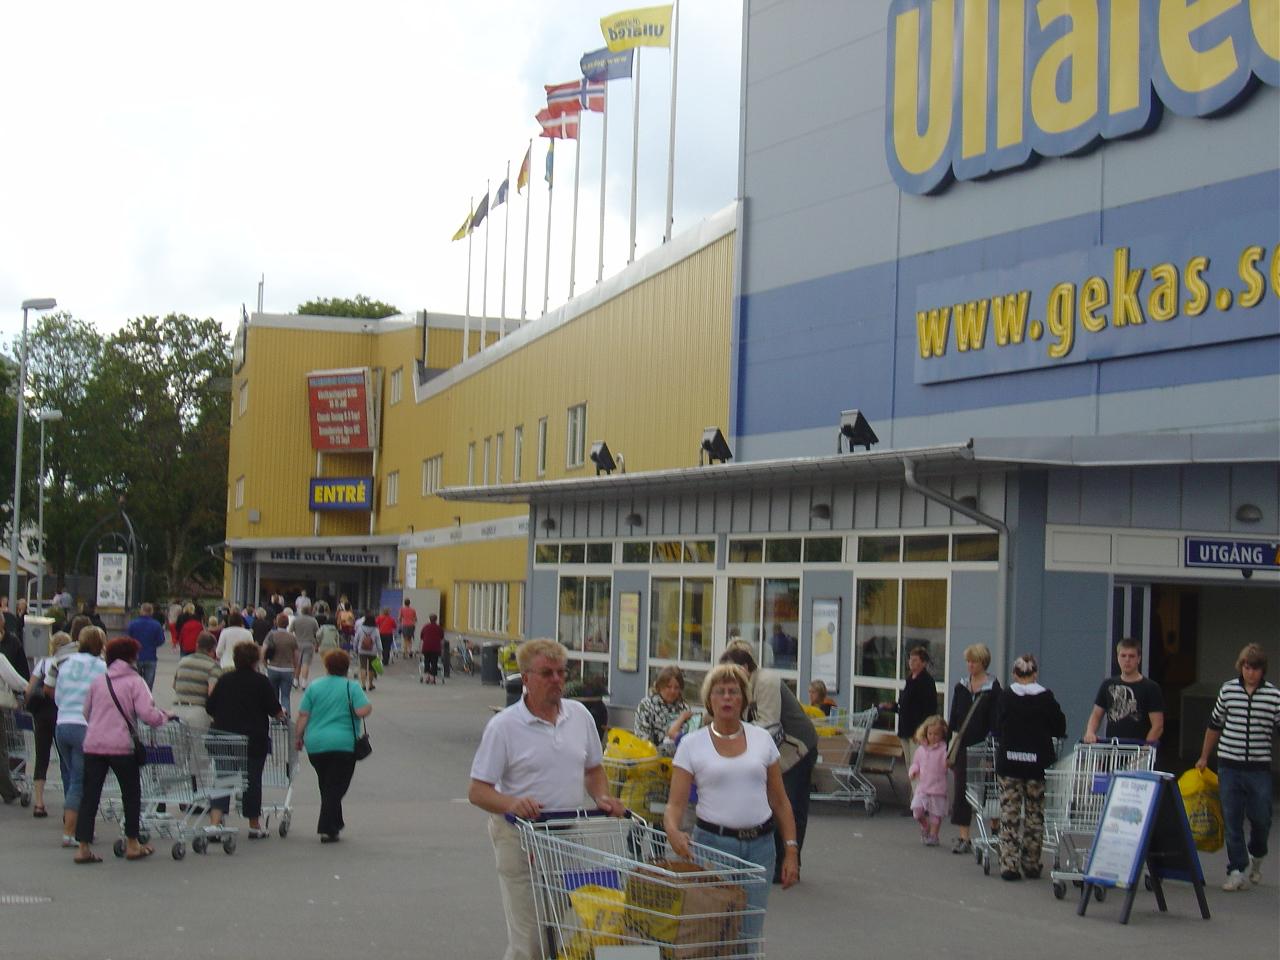 Gekas Ullared - Halland